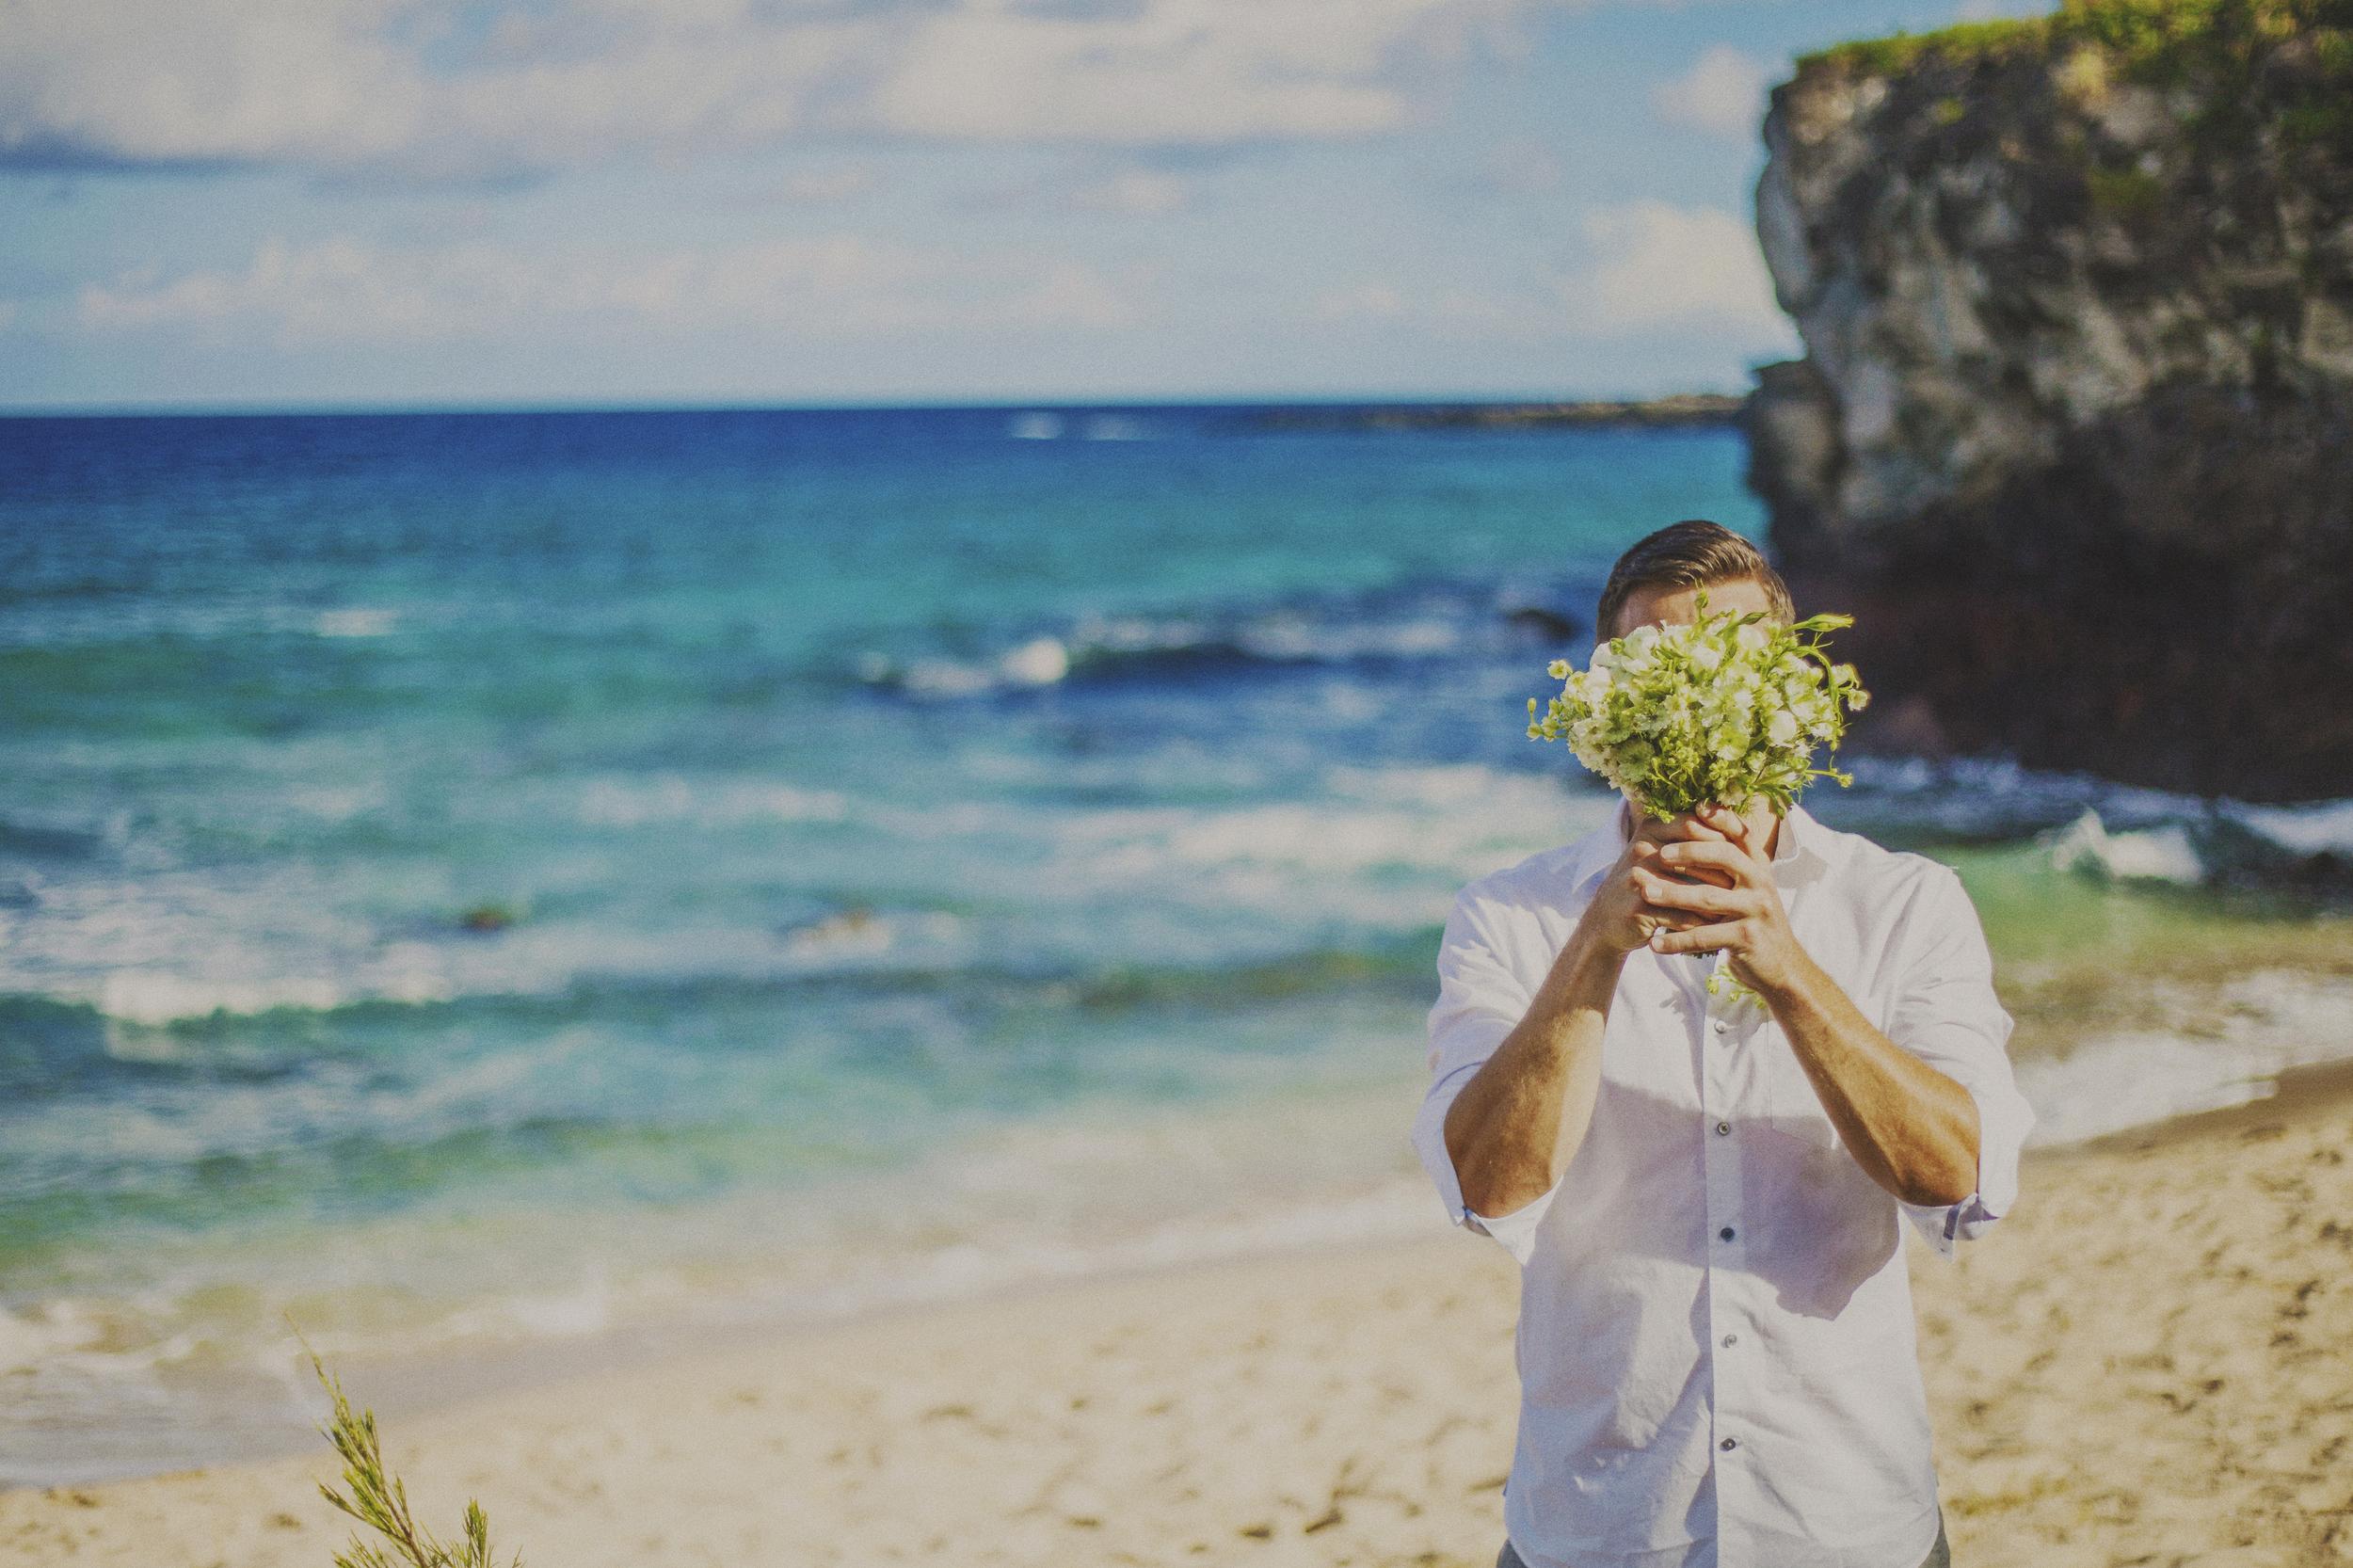 angie-diaz-photography-maui-elopement-oneloa-ironwoods-beach-18.jpg